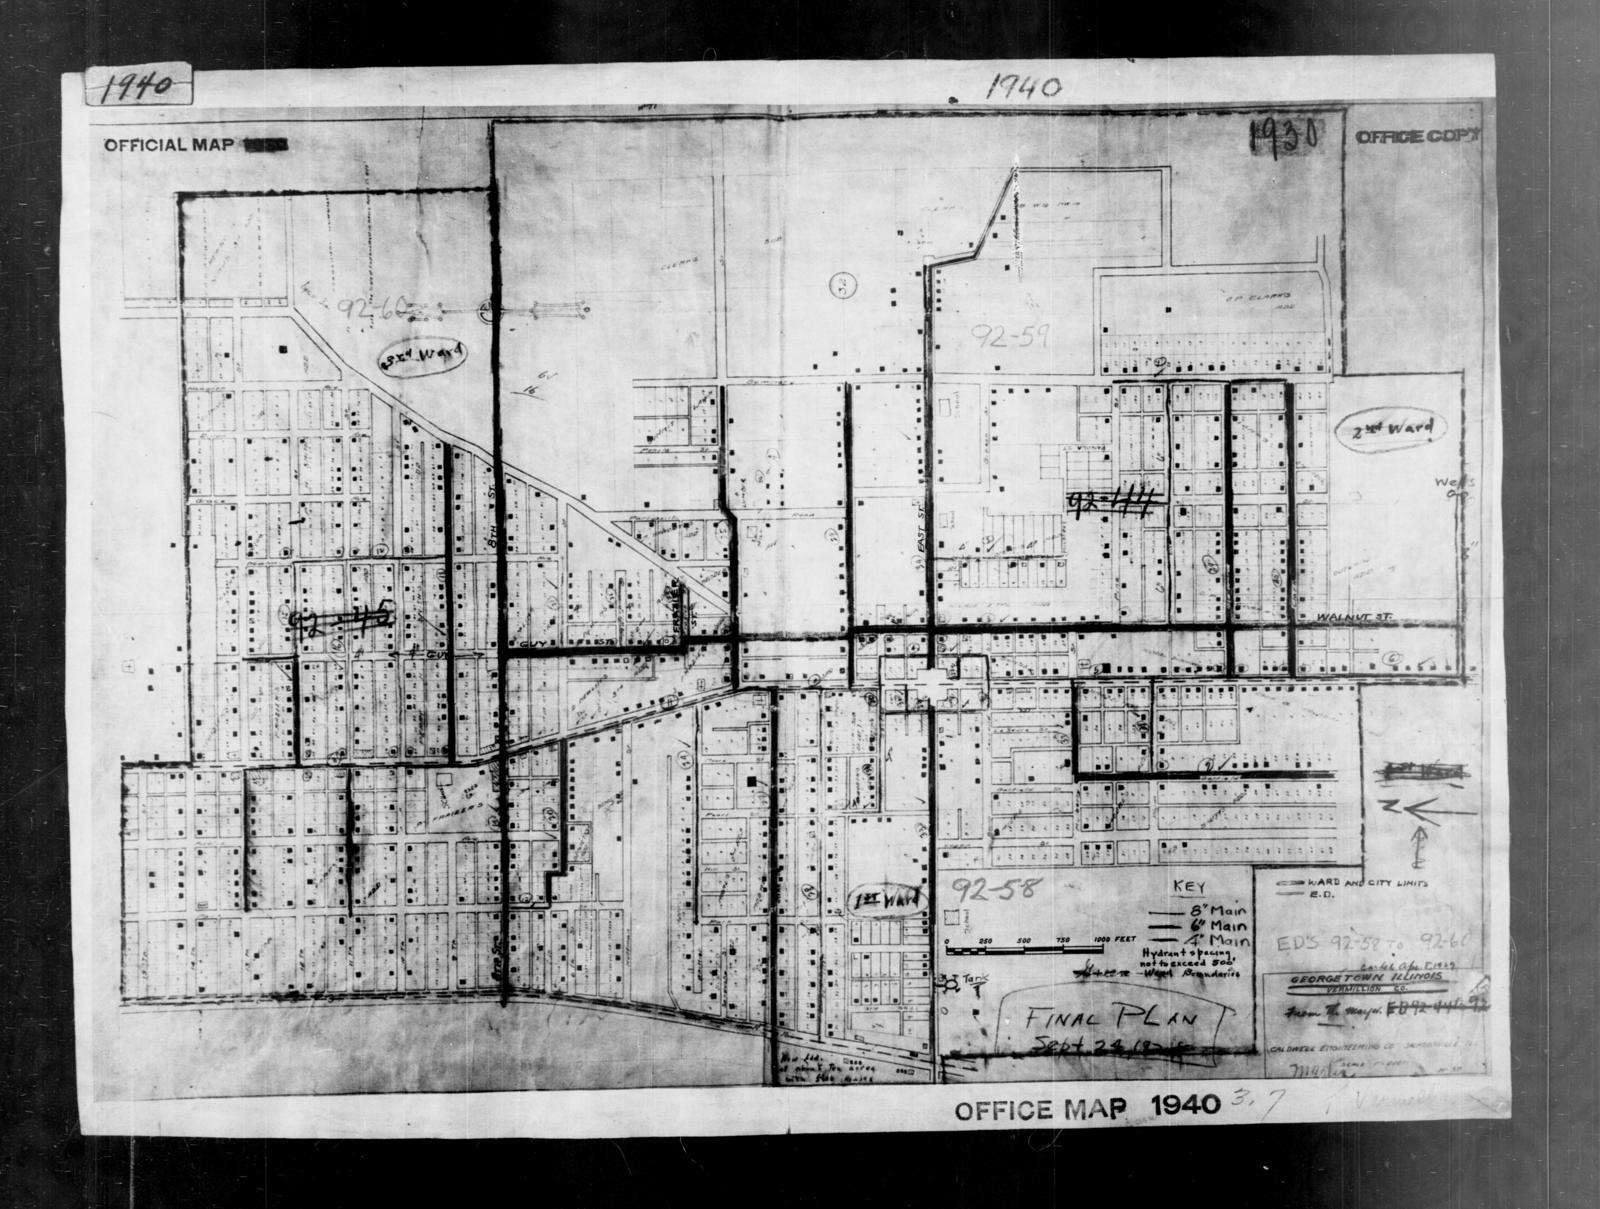 1940 Census Enumeration District Maps - Illinois - Vermilion County - Georgetown - ED 92-58, ED 92-59A, ED 92-59B, ED 92-60